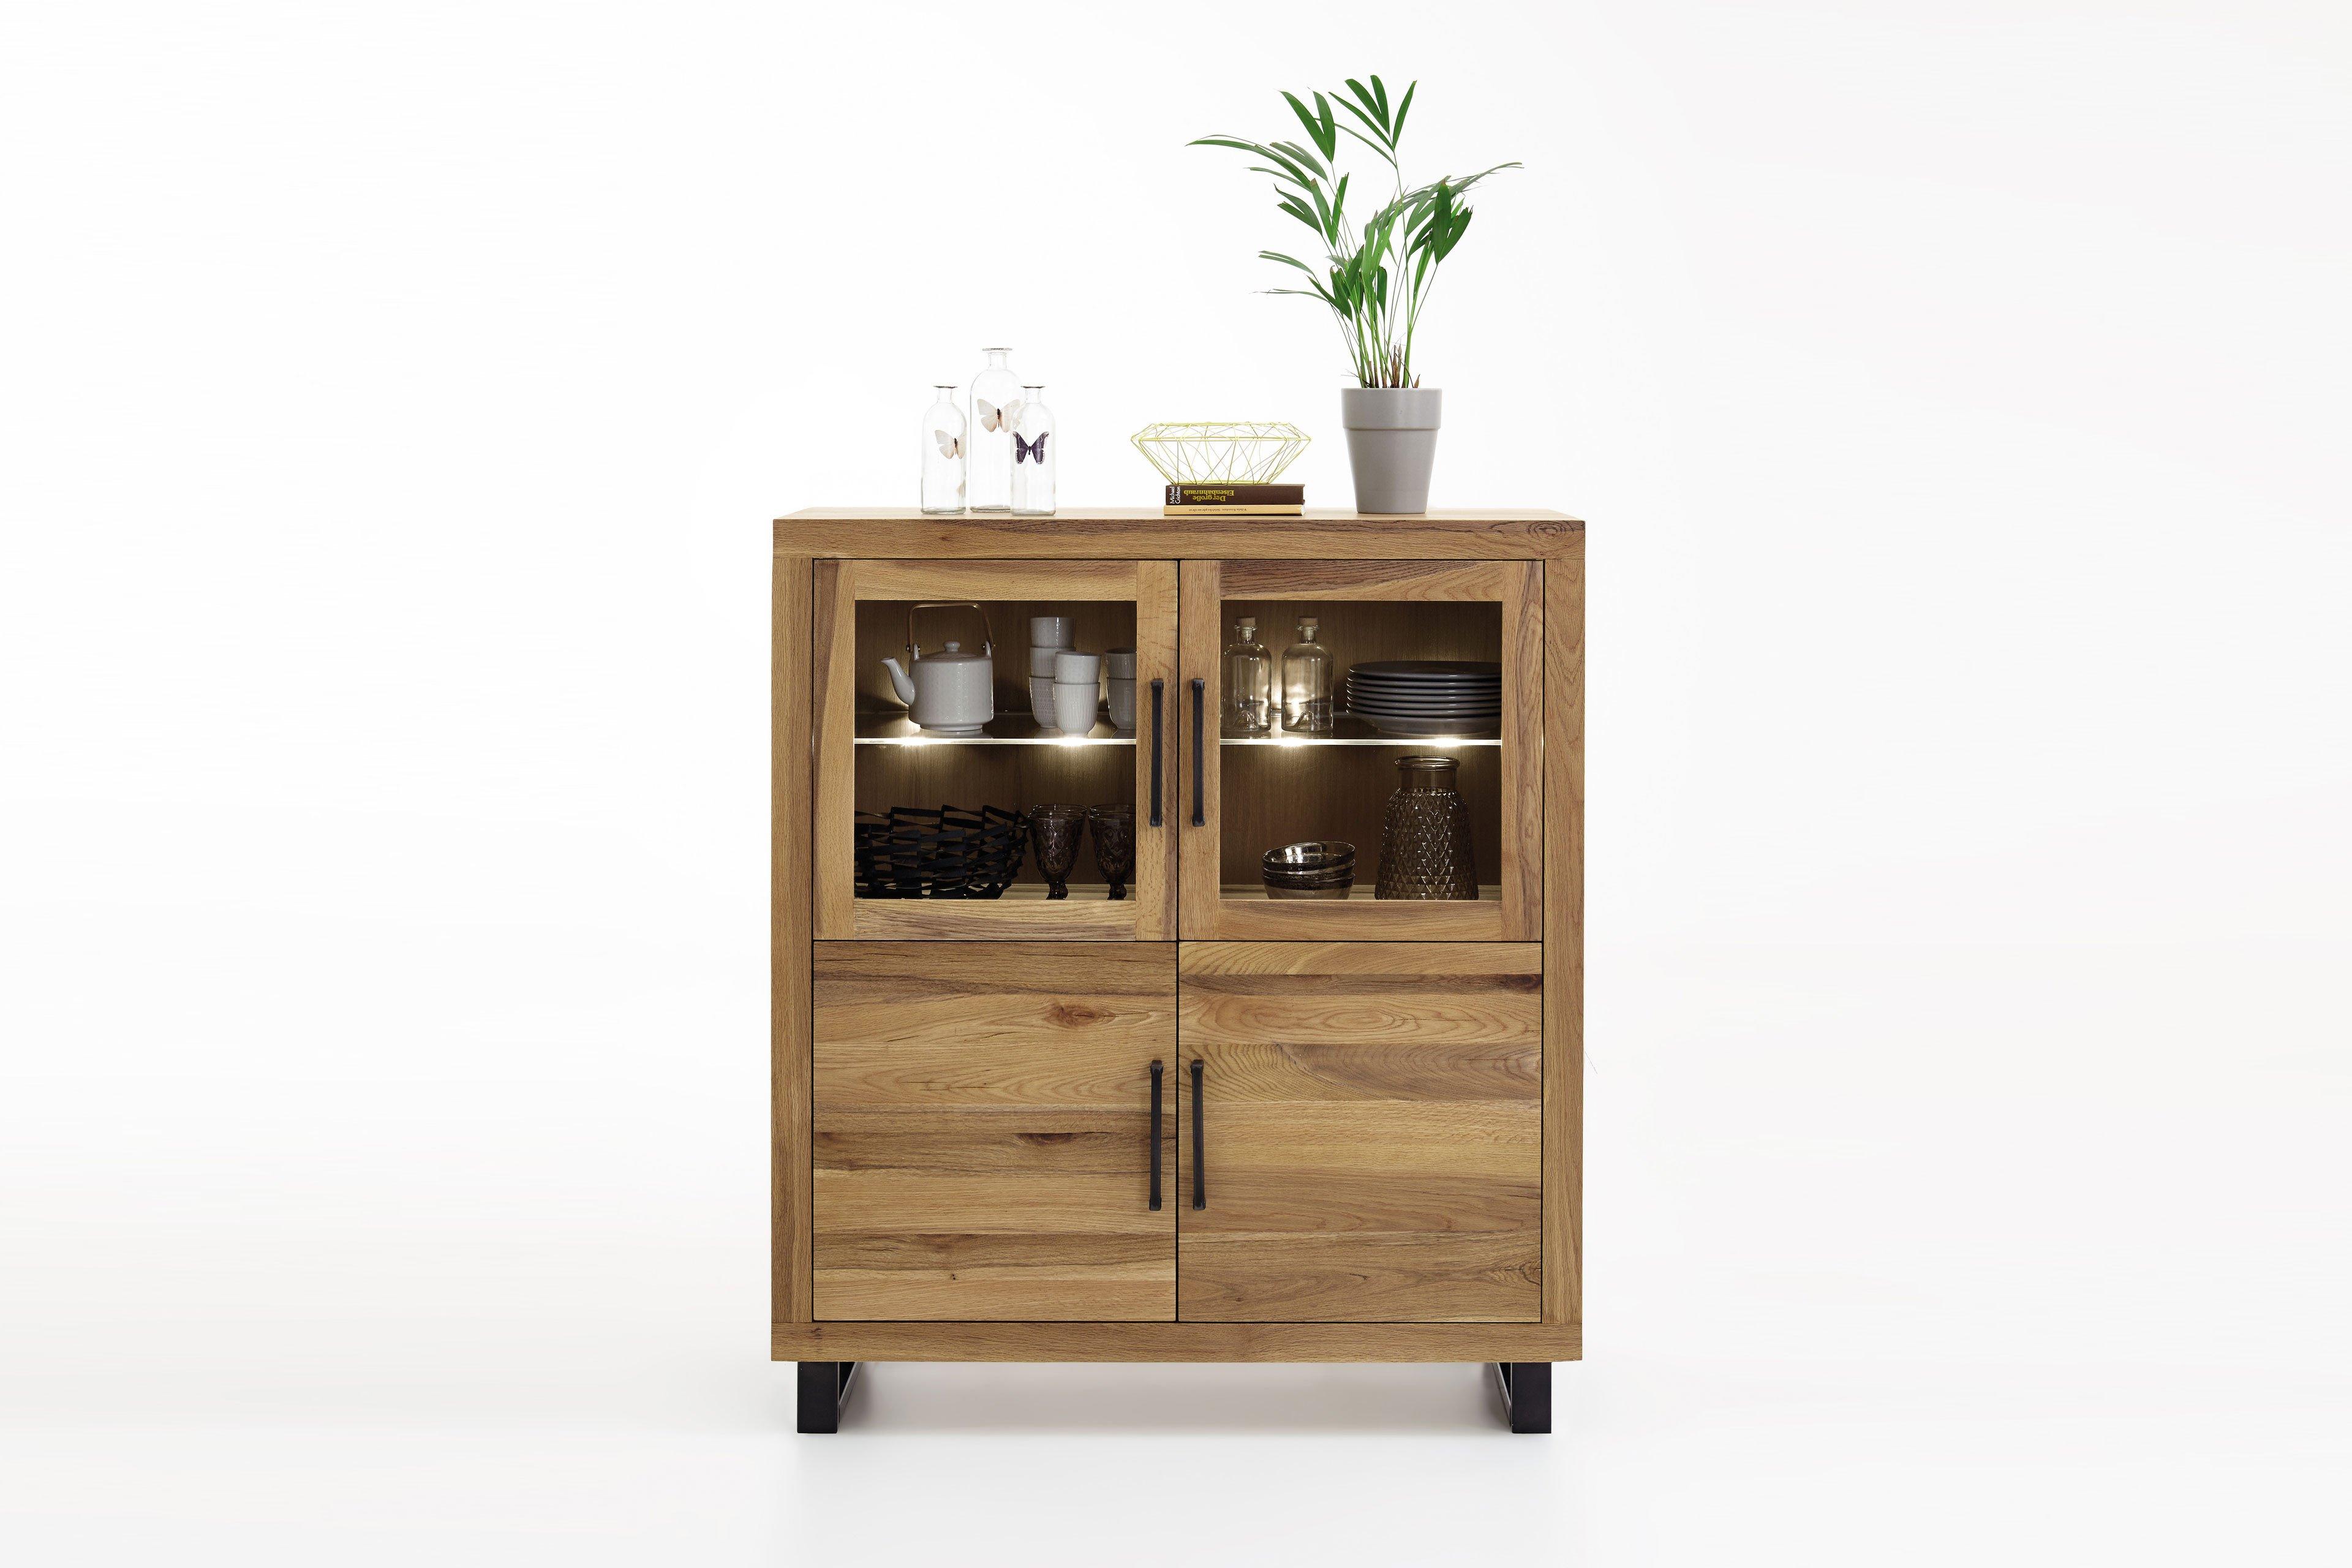 highboard jorik von pure natur m bel letz ihr online shop. Black Bedroom Furniture Sets. Home Design Ideas